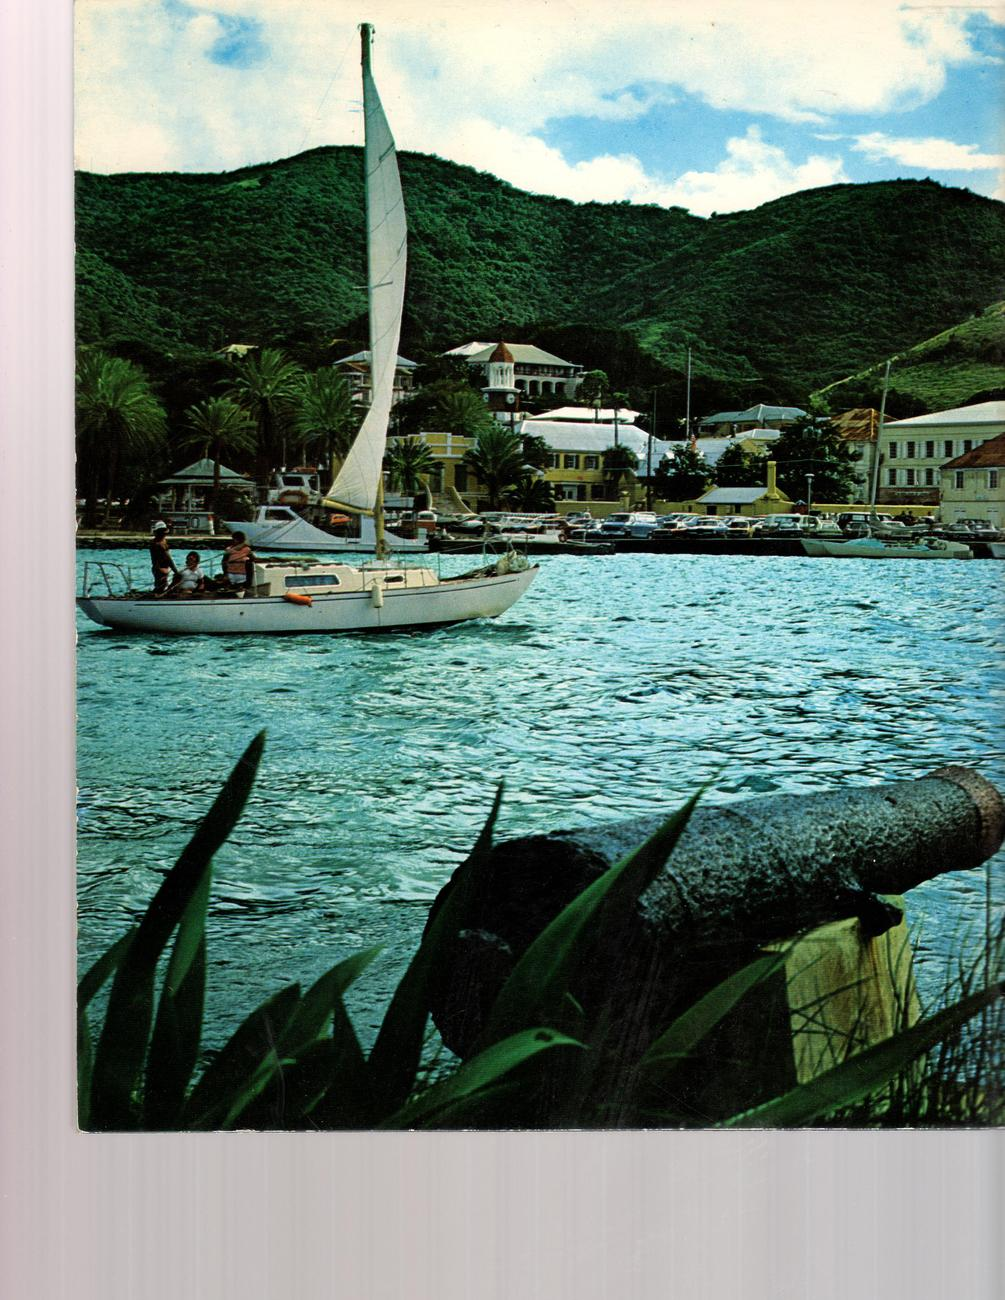 The Sunny Virgin Islands - St Thomas, St. Croix, St. John, Tortola, Virgin Gorda